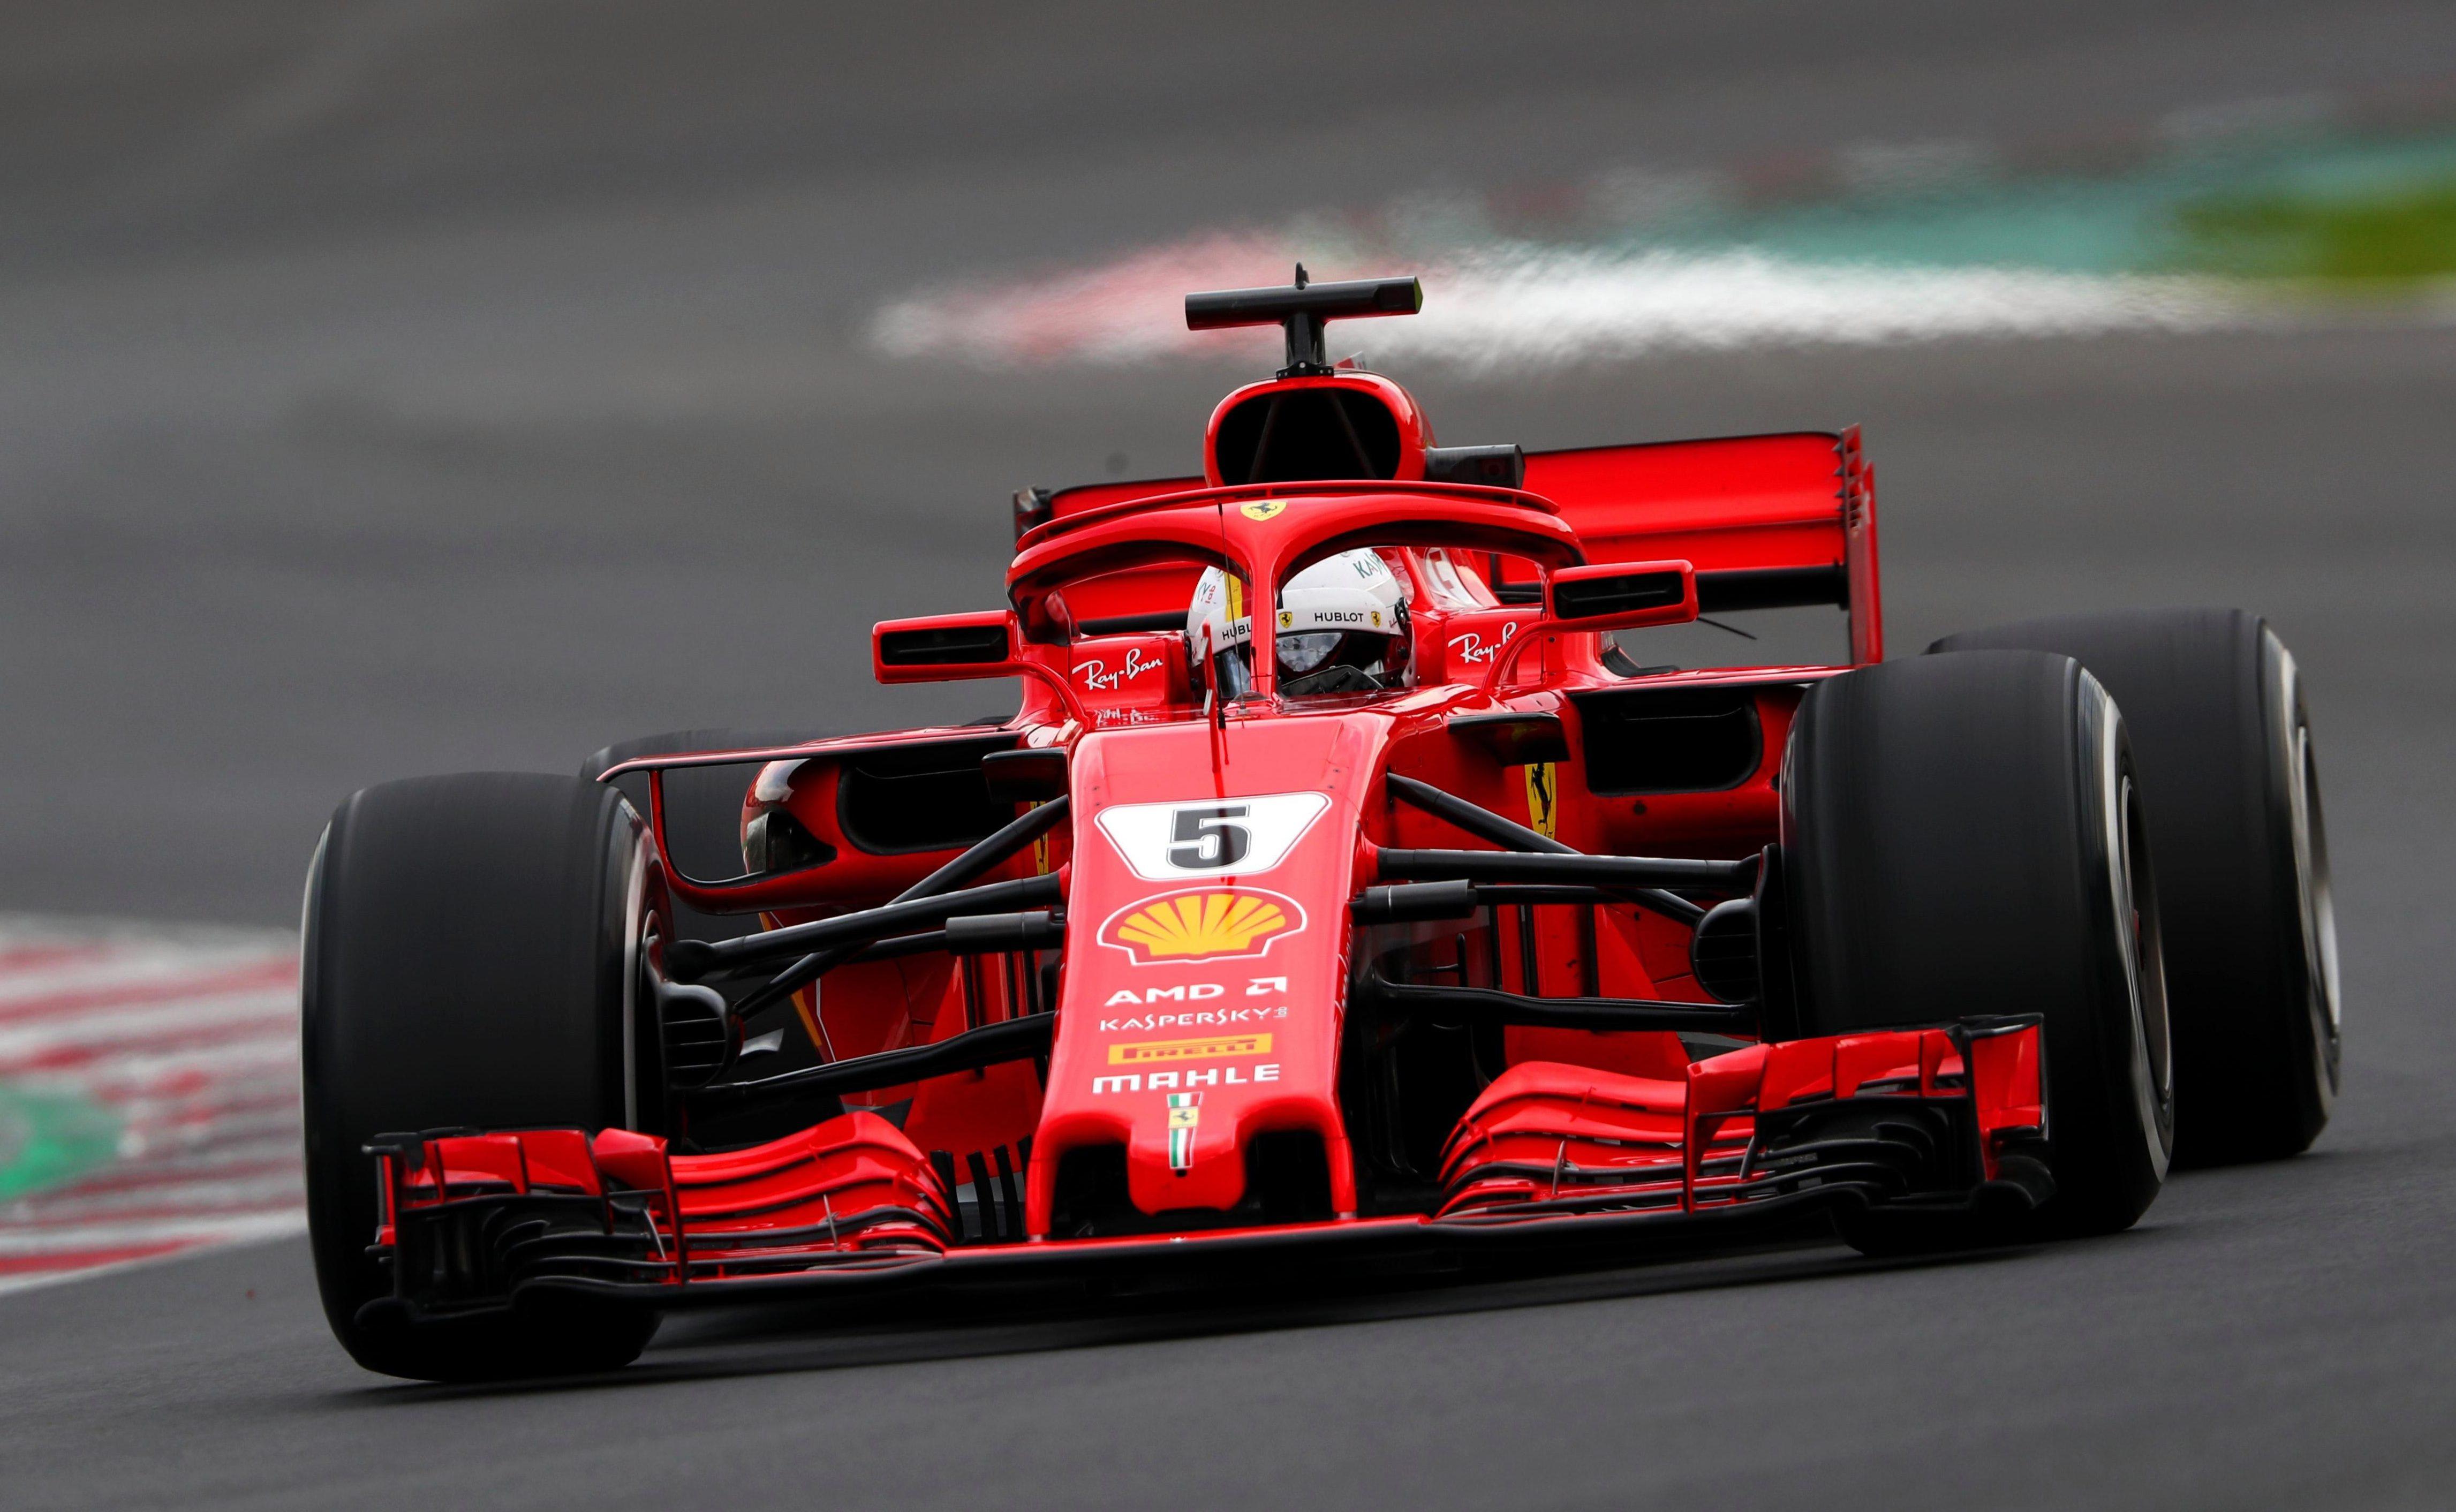 Sebastian Vettel is looking to win a fifth world championship